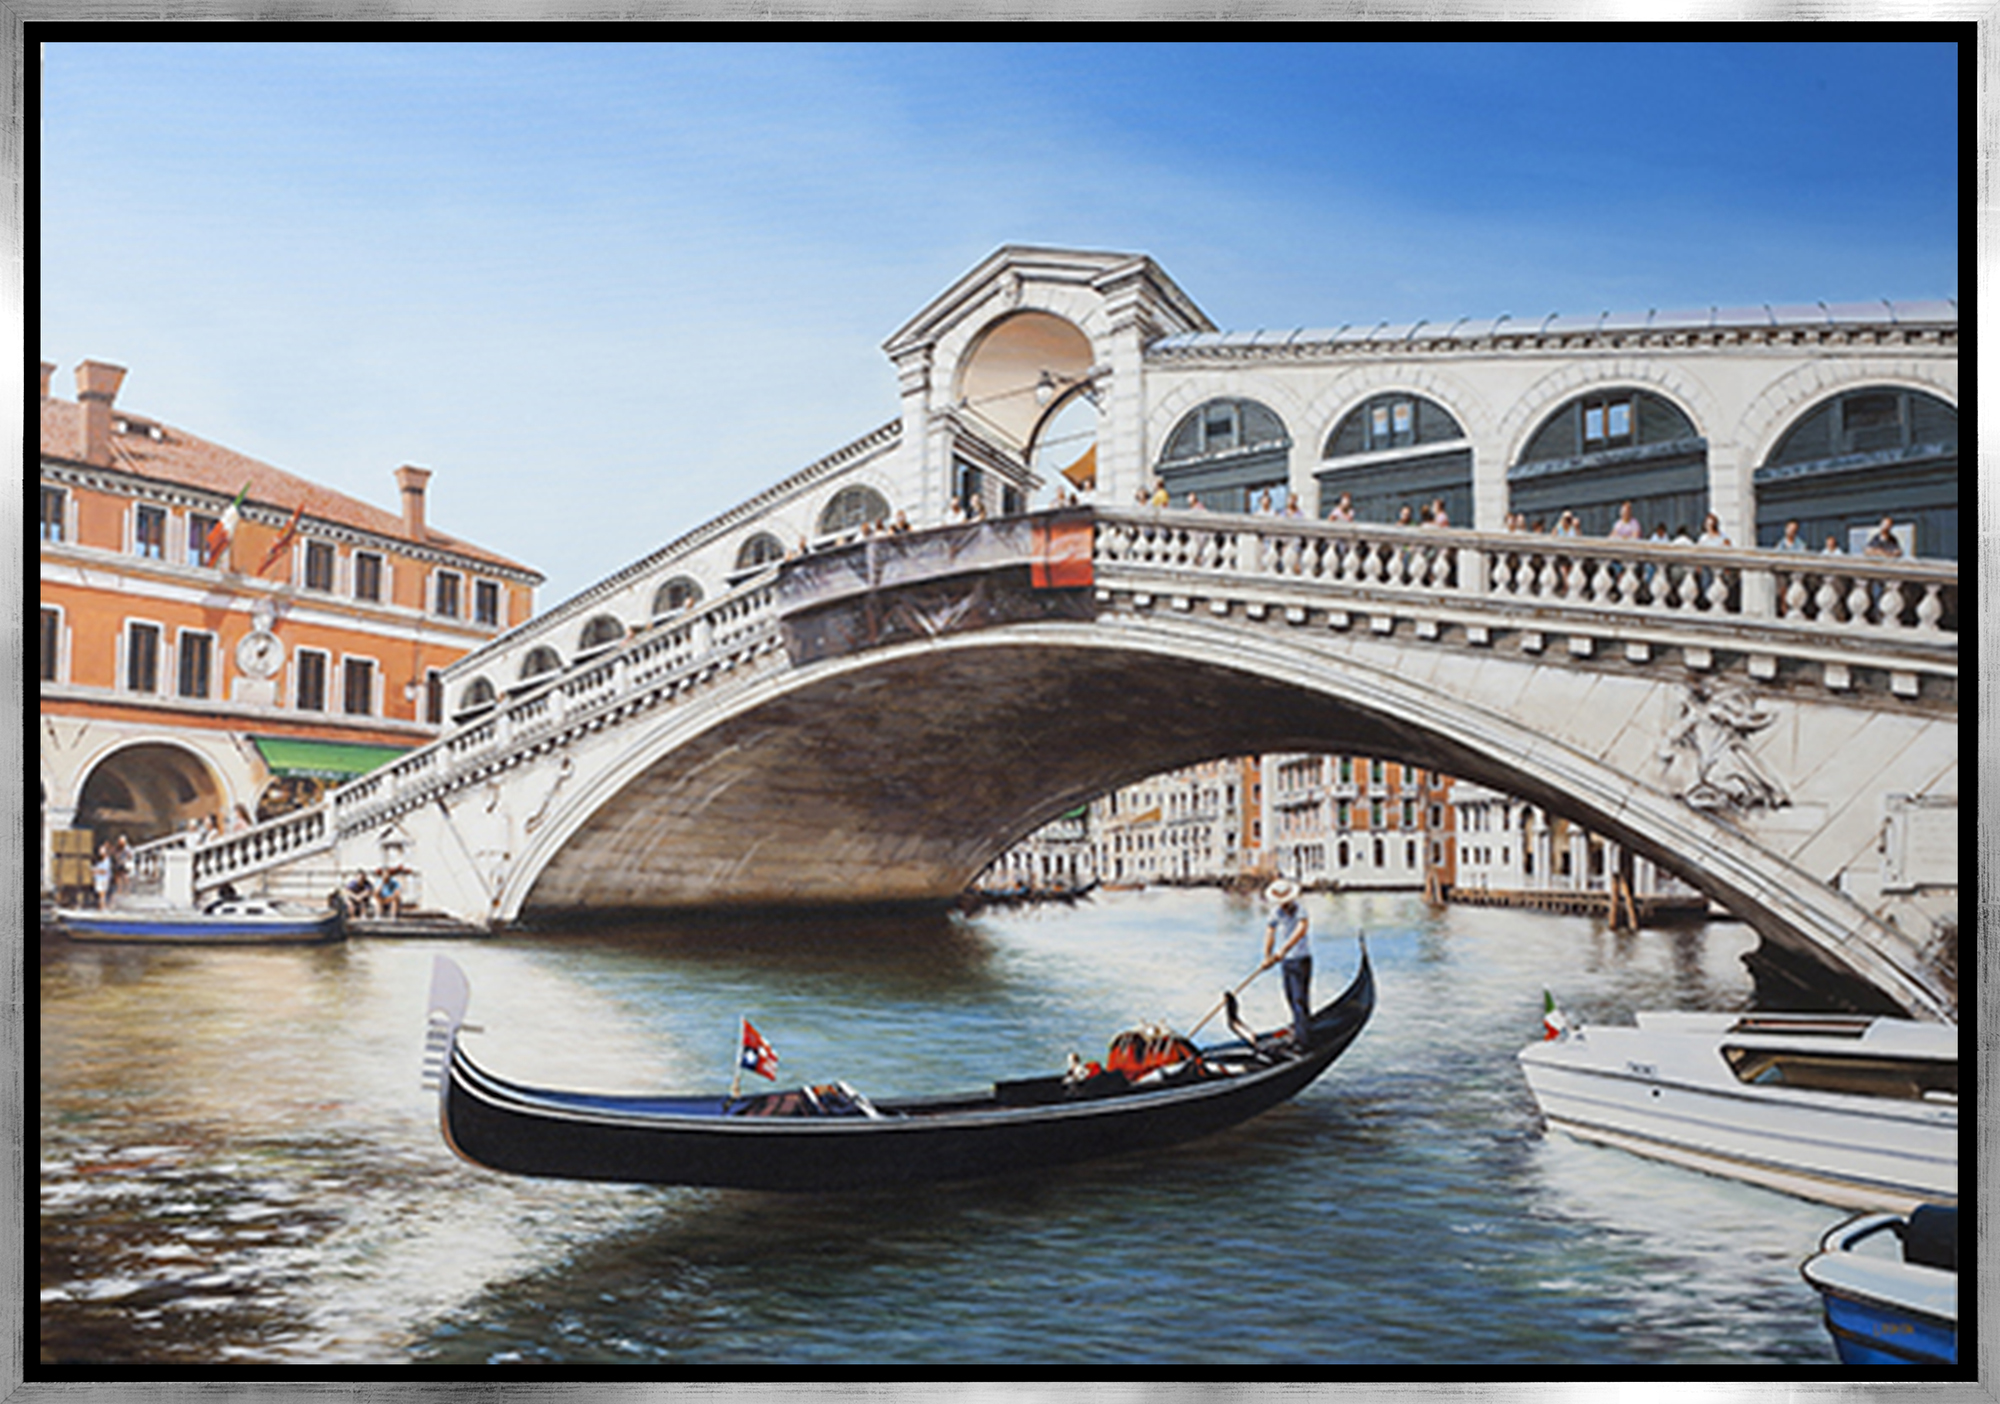 Luigi Rocca - Nice Gondola Ride , 6855-006-338